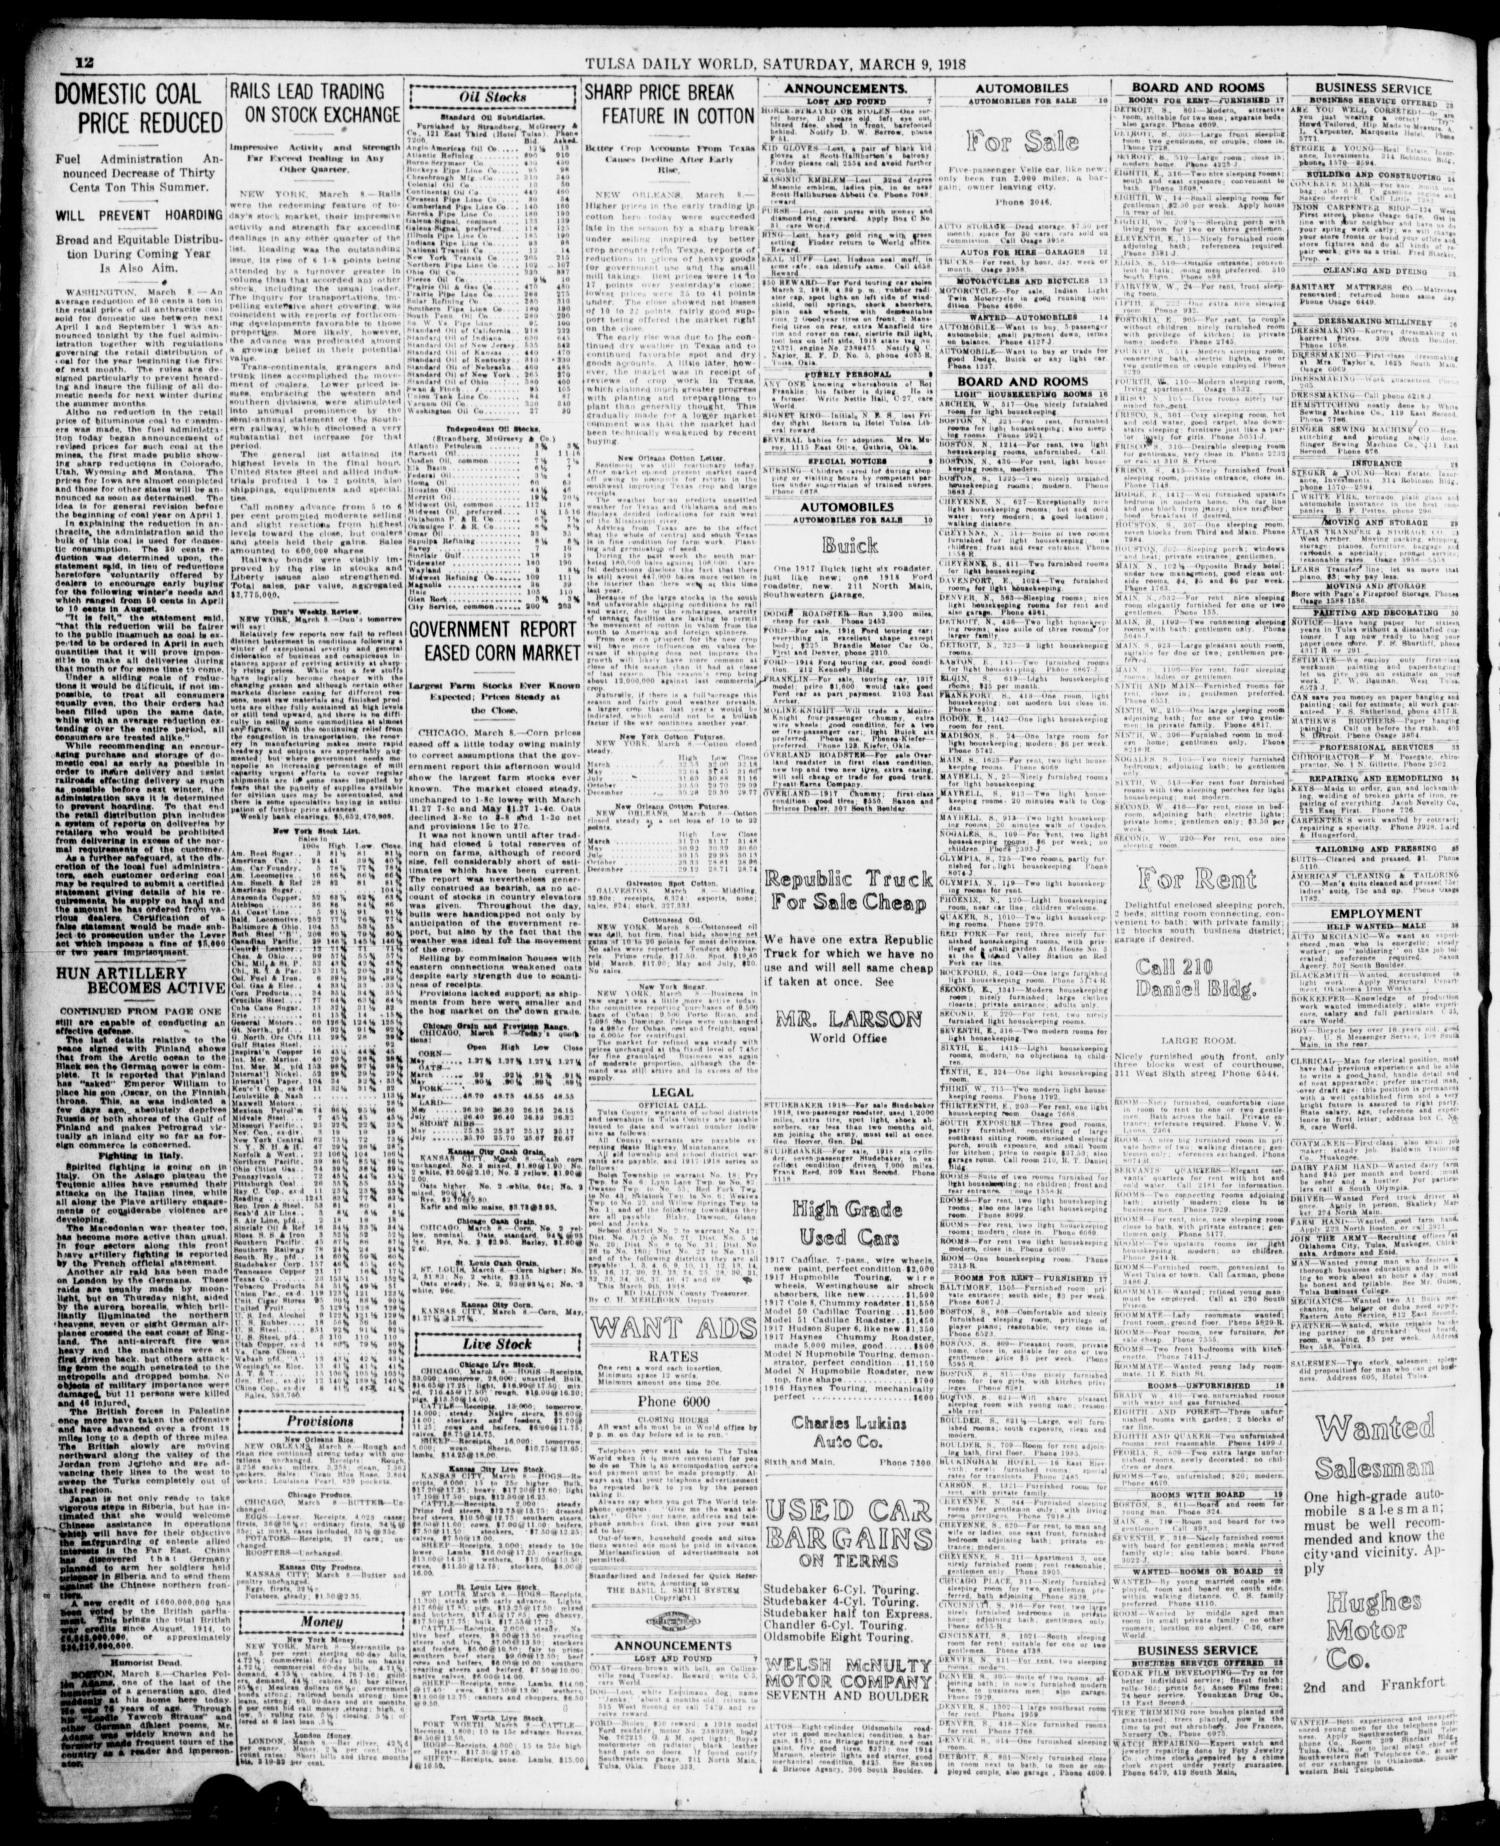 Tulsa Daily World (Tulsa, Okla ), Vol  13, No  173, Ed  1 Saturday